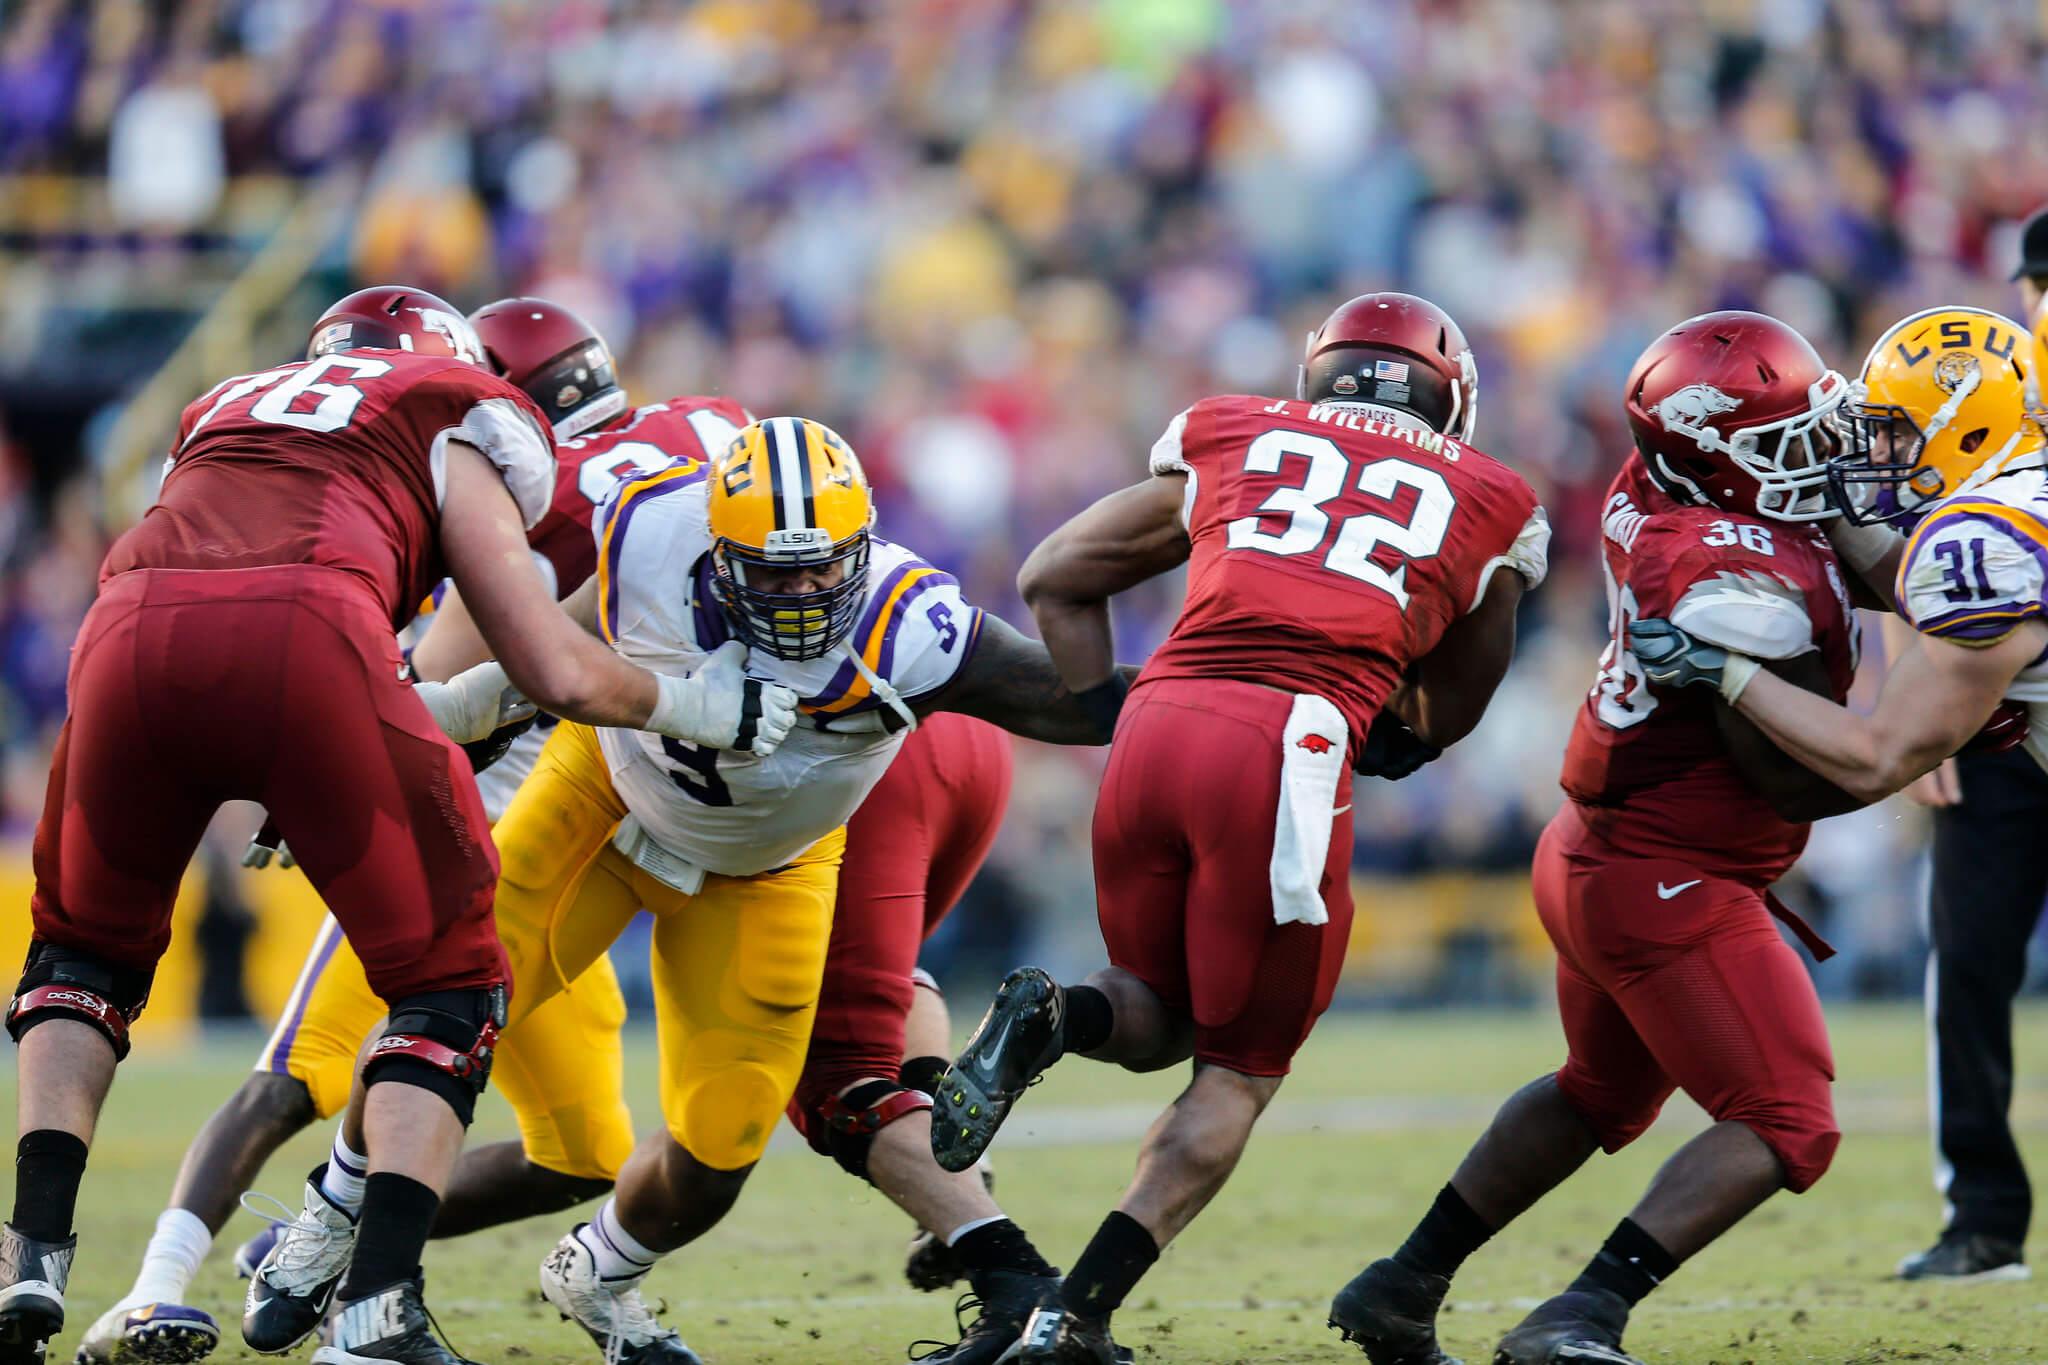 LSU vs Arkansas Golden Boot Trophy football game